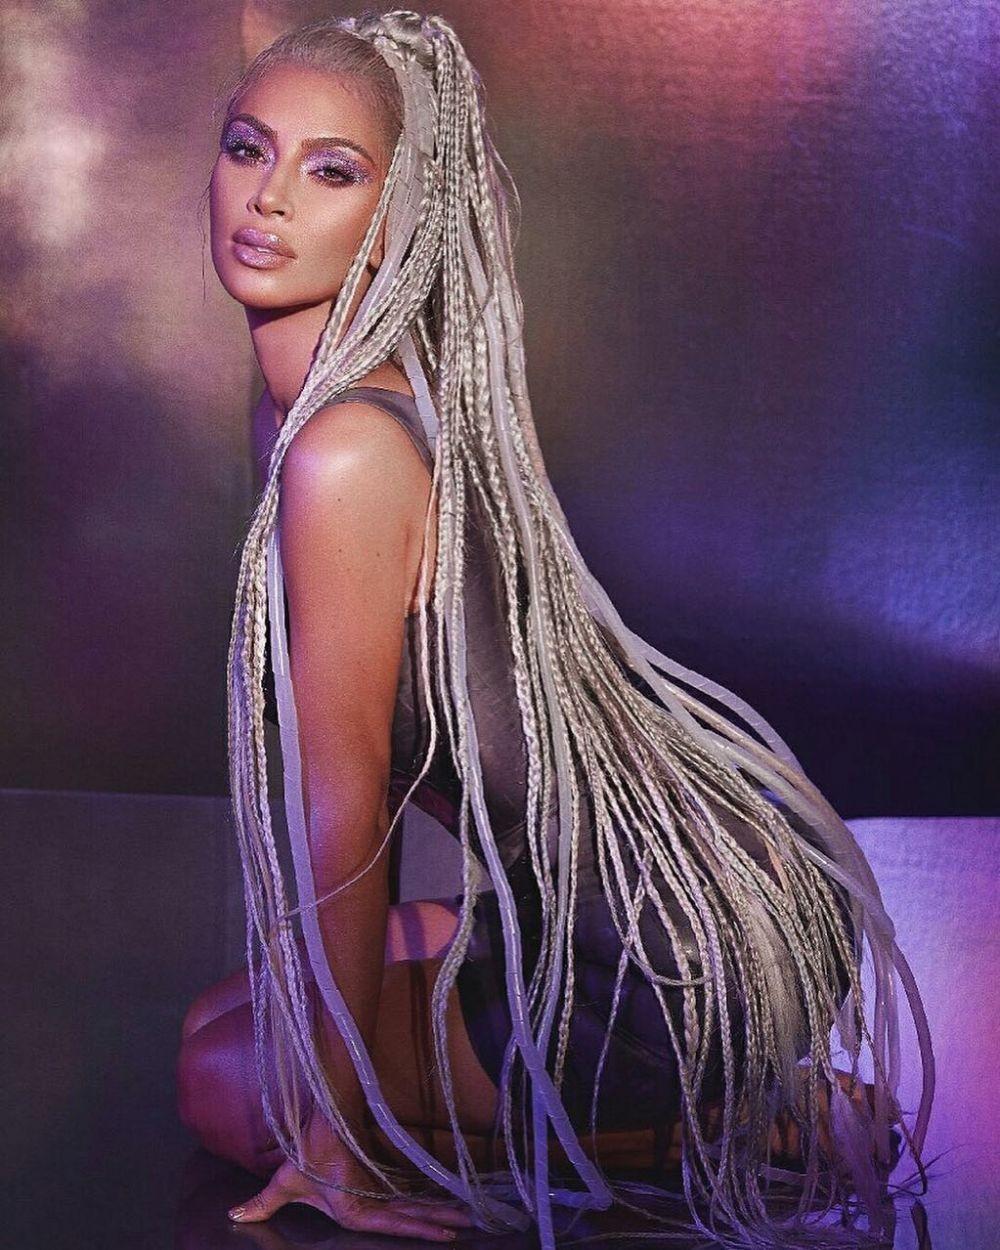 10 Gaya Rambut Ajaib ala Kardashian Sisters, Unik namun Tetap Flawless